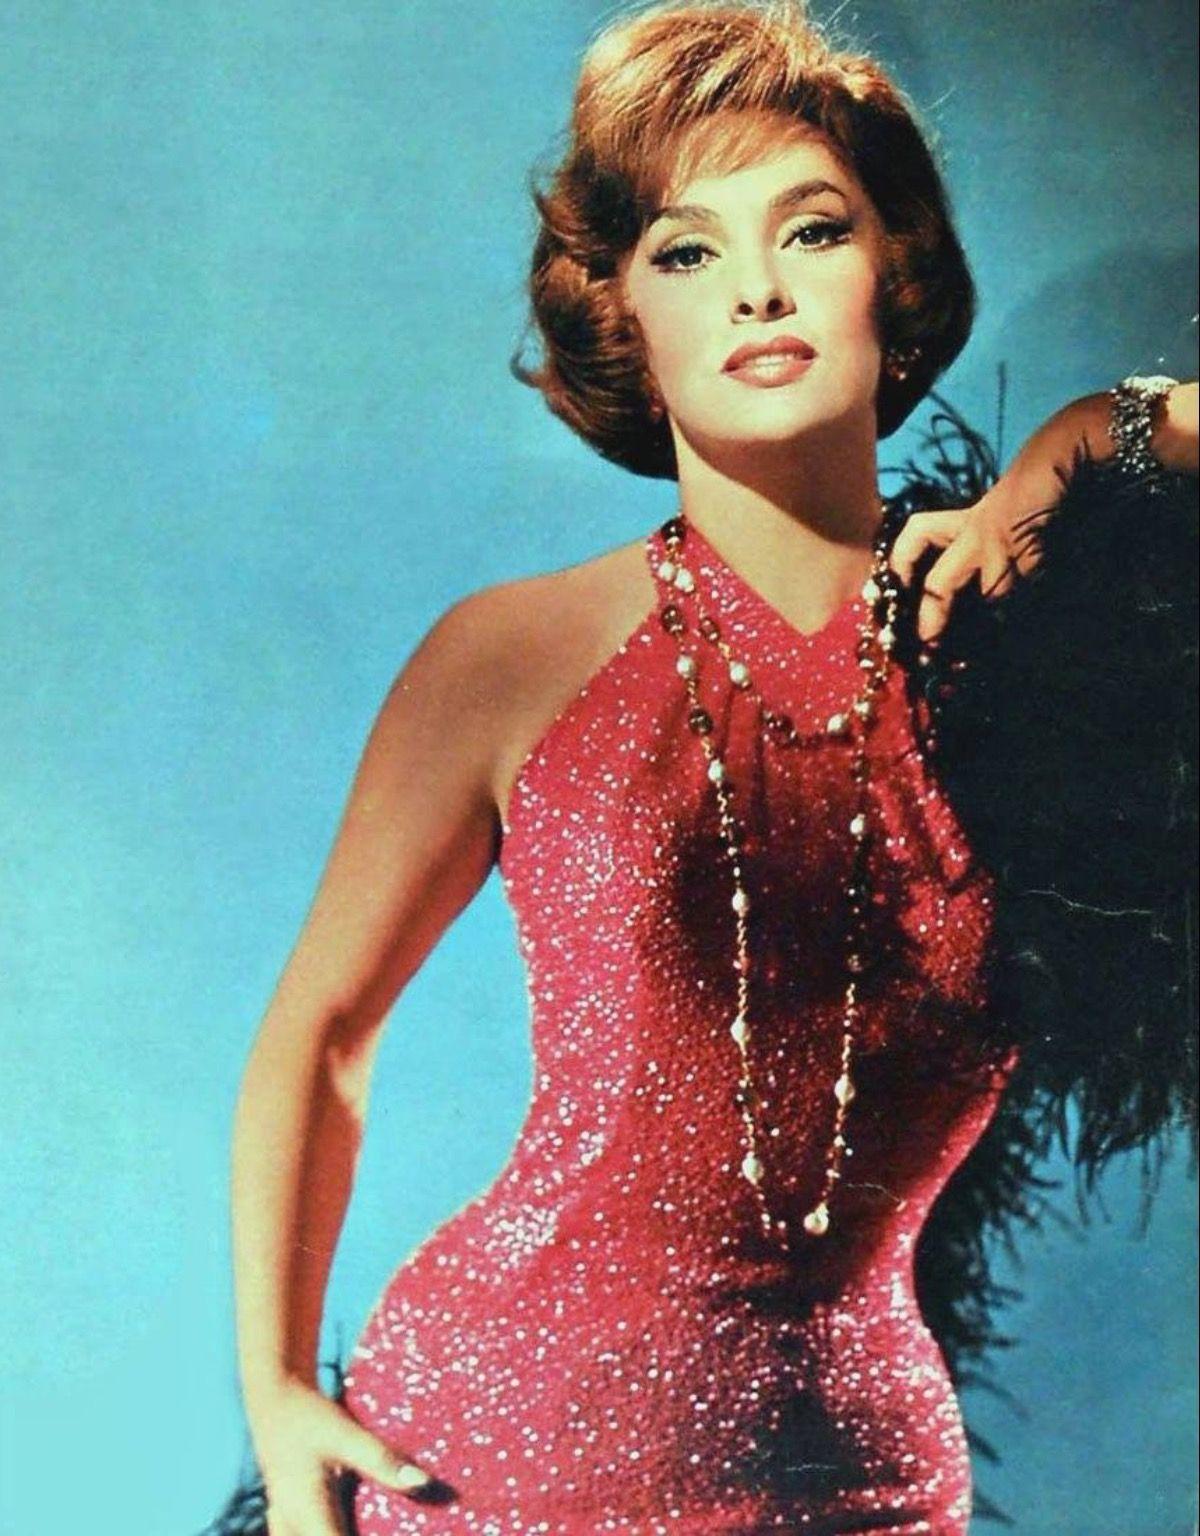 Gina Lollobrigida Beautiful Color Photo Of Her  Gina -1496